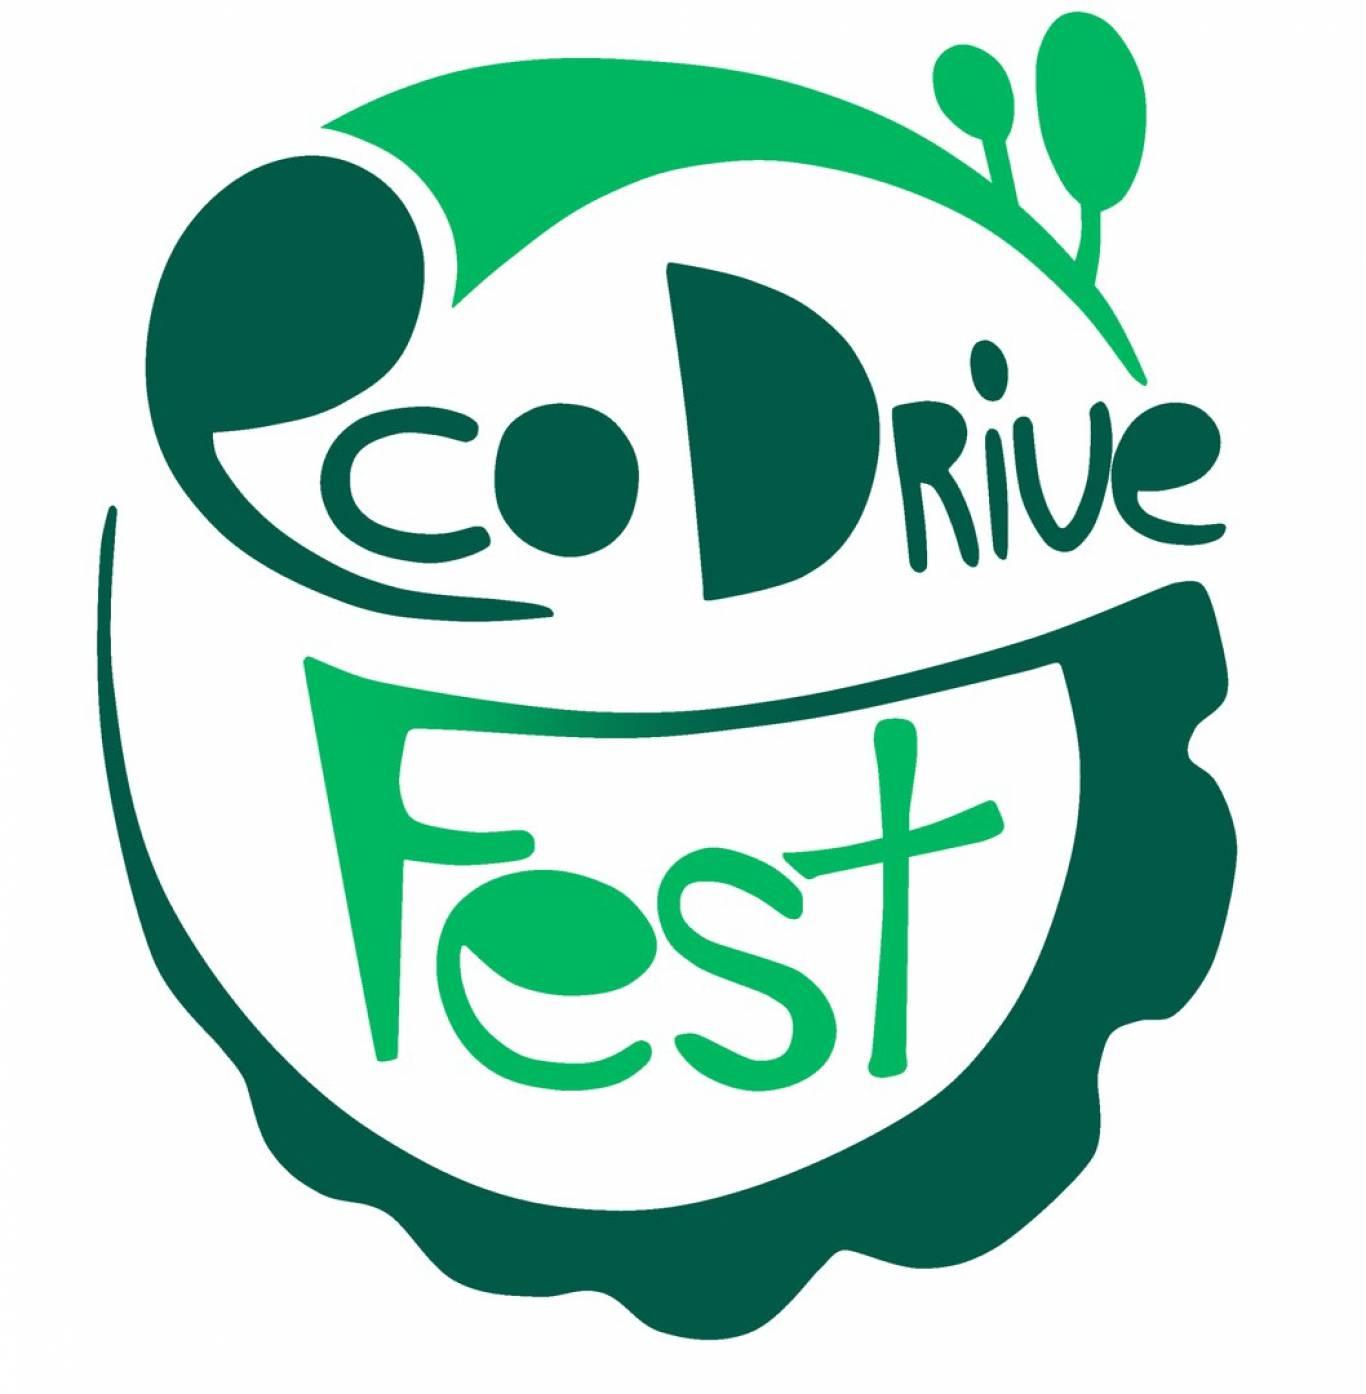 EcoDriveFest